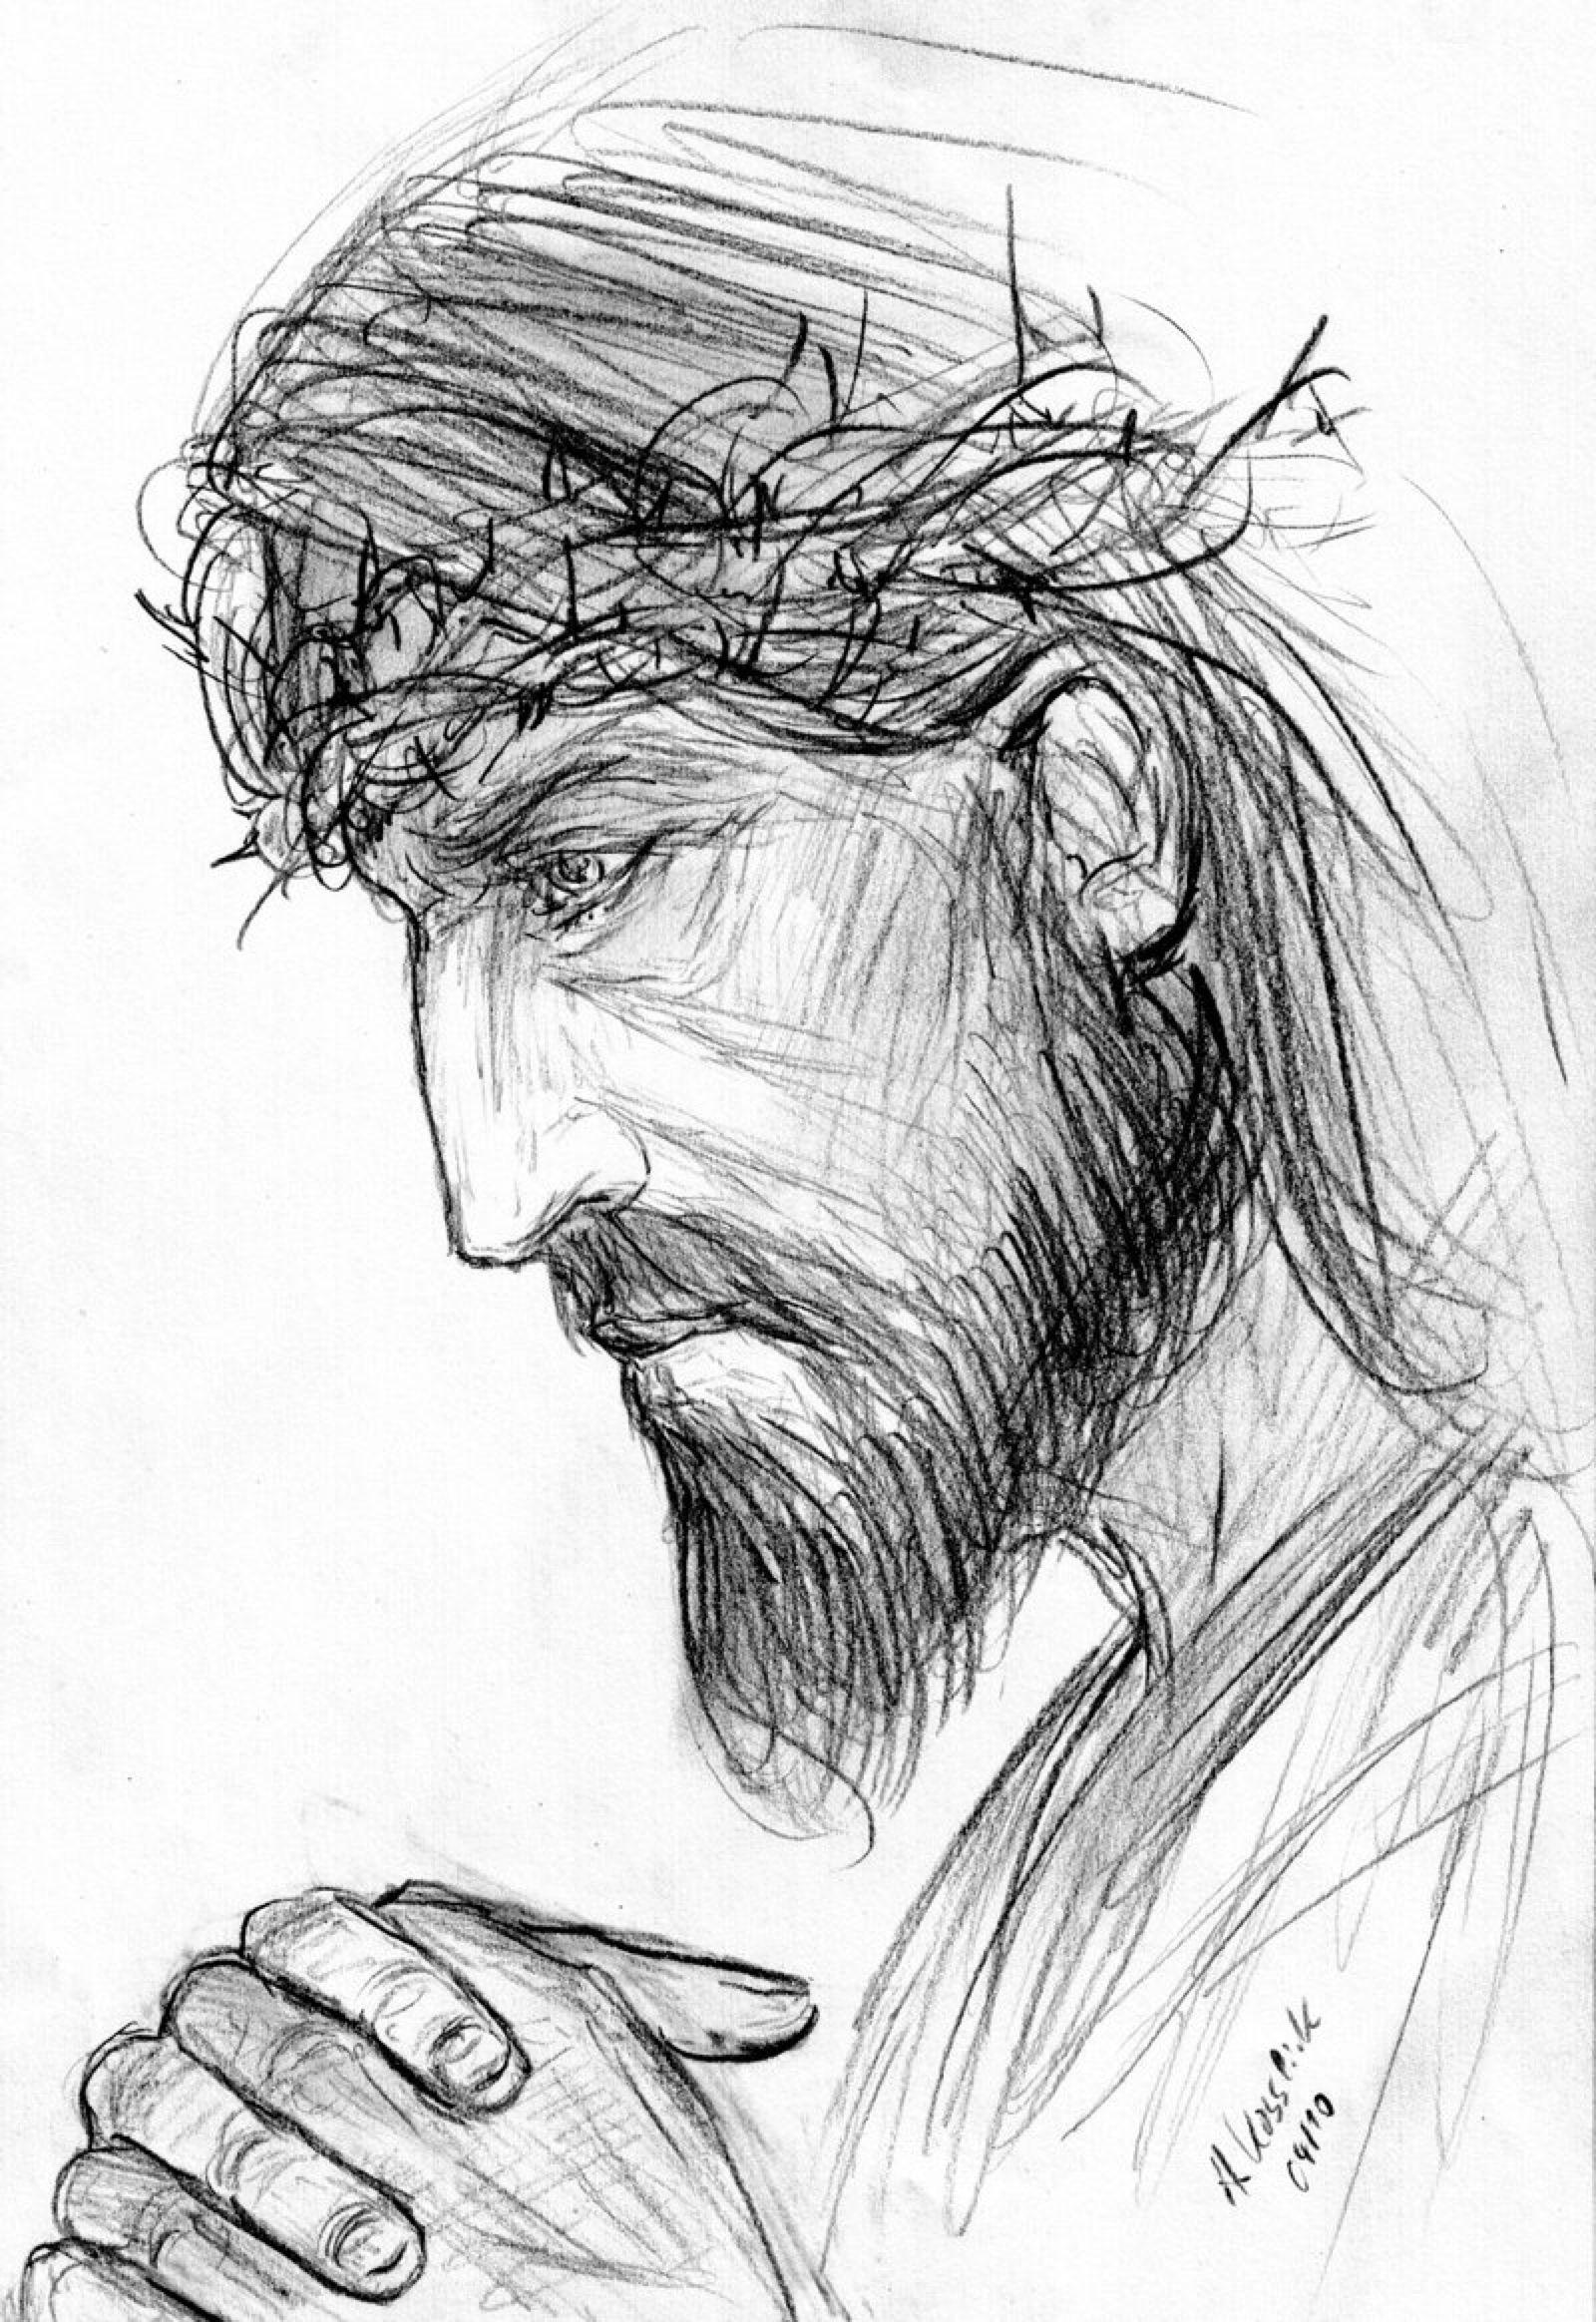 christus sketch by andrekosslick on DeviantArt